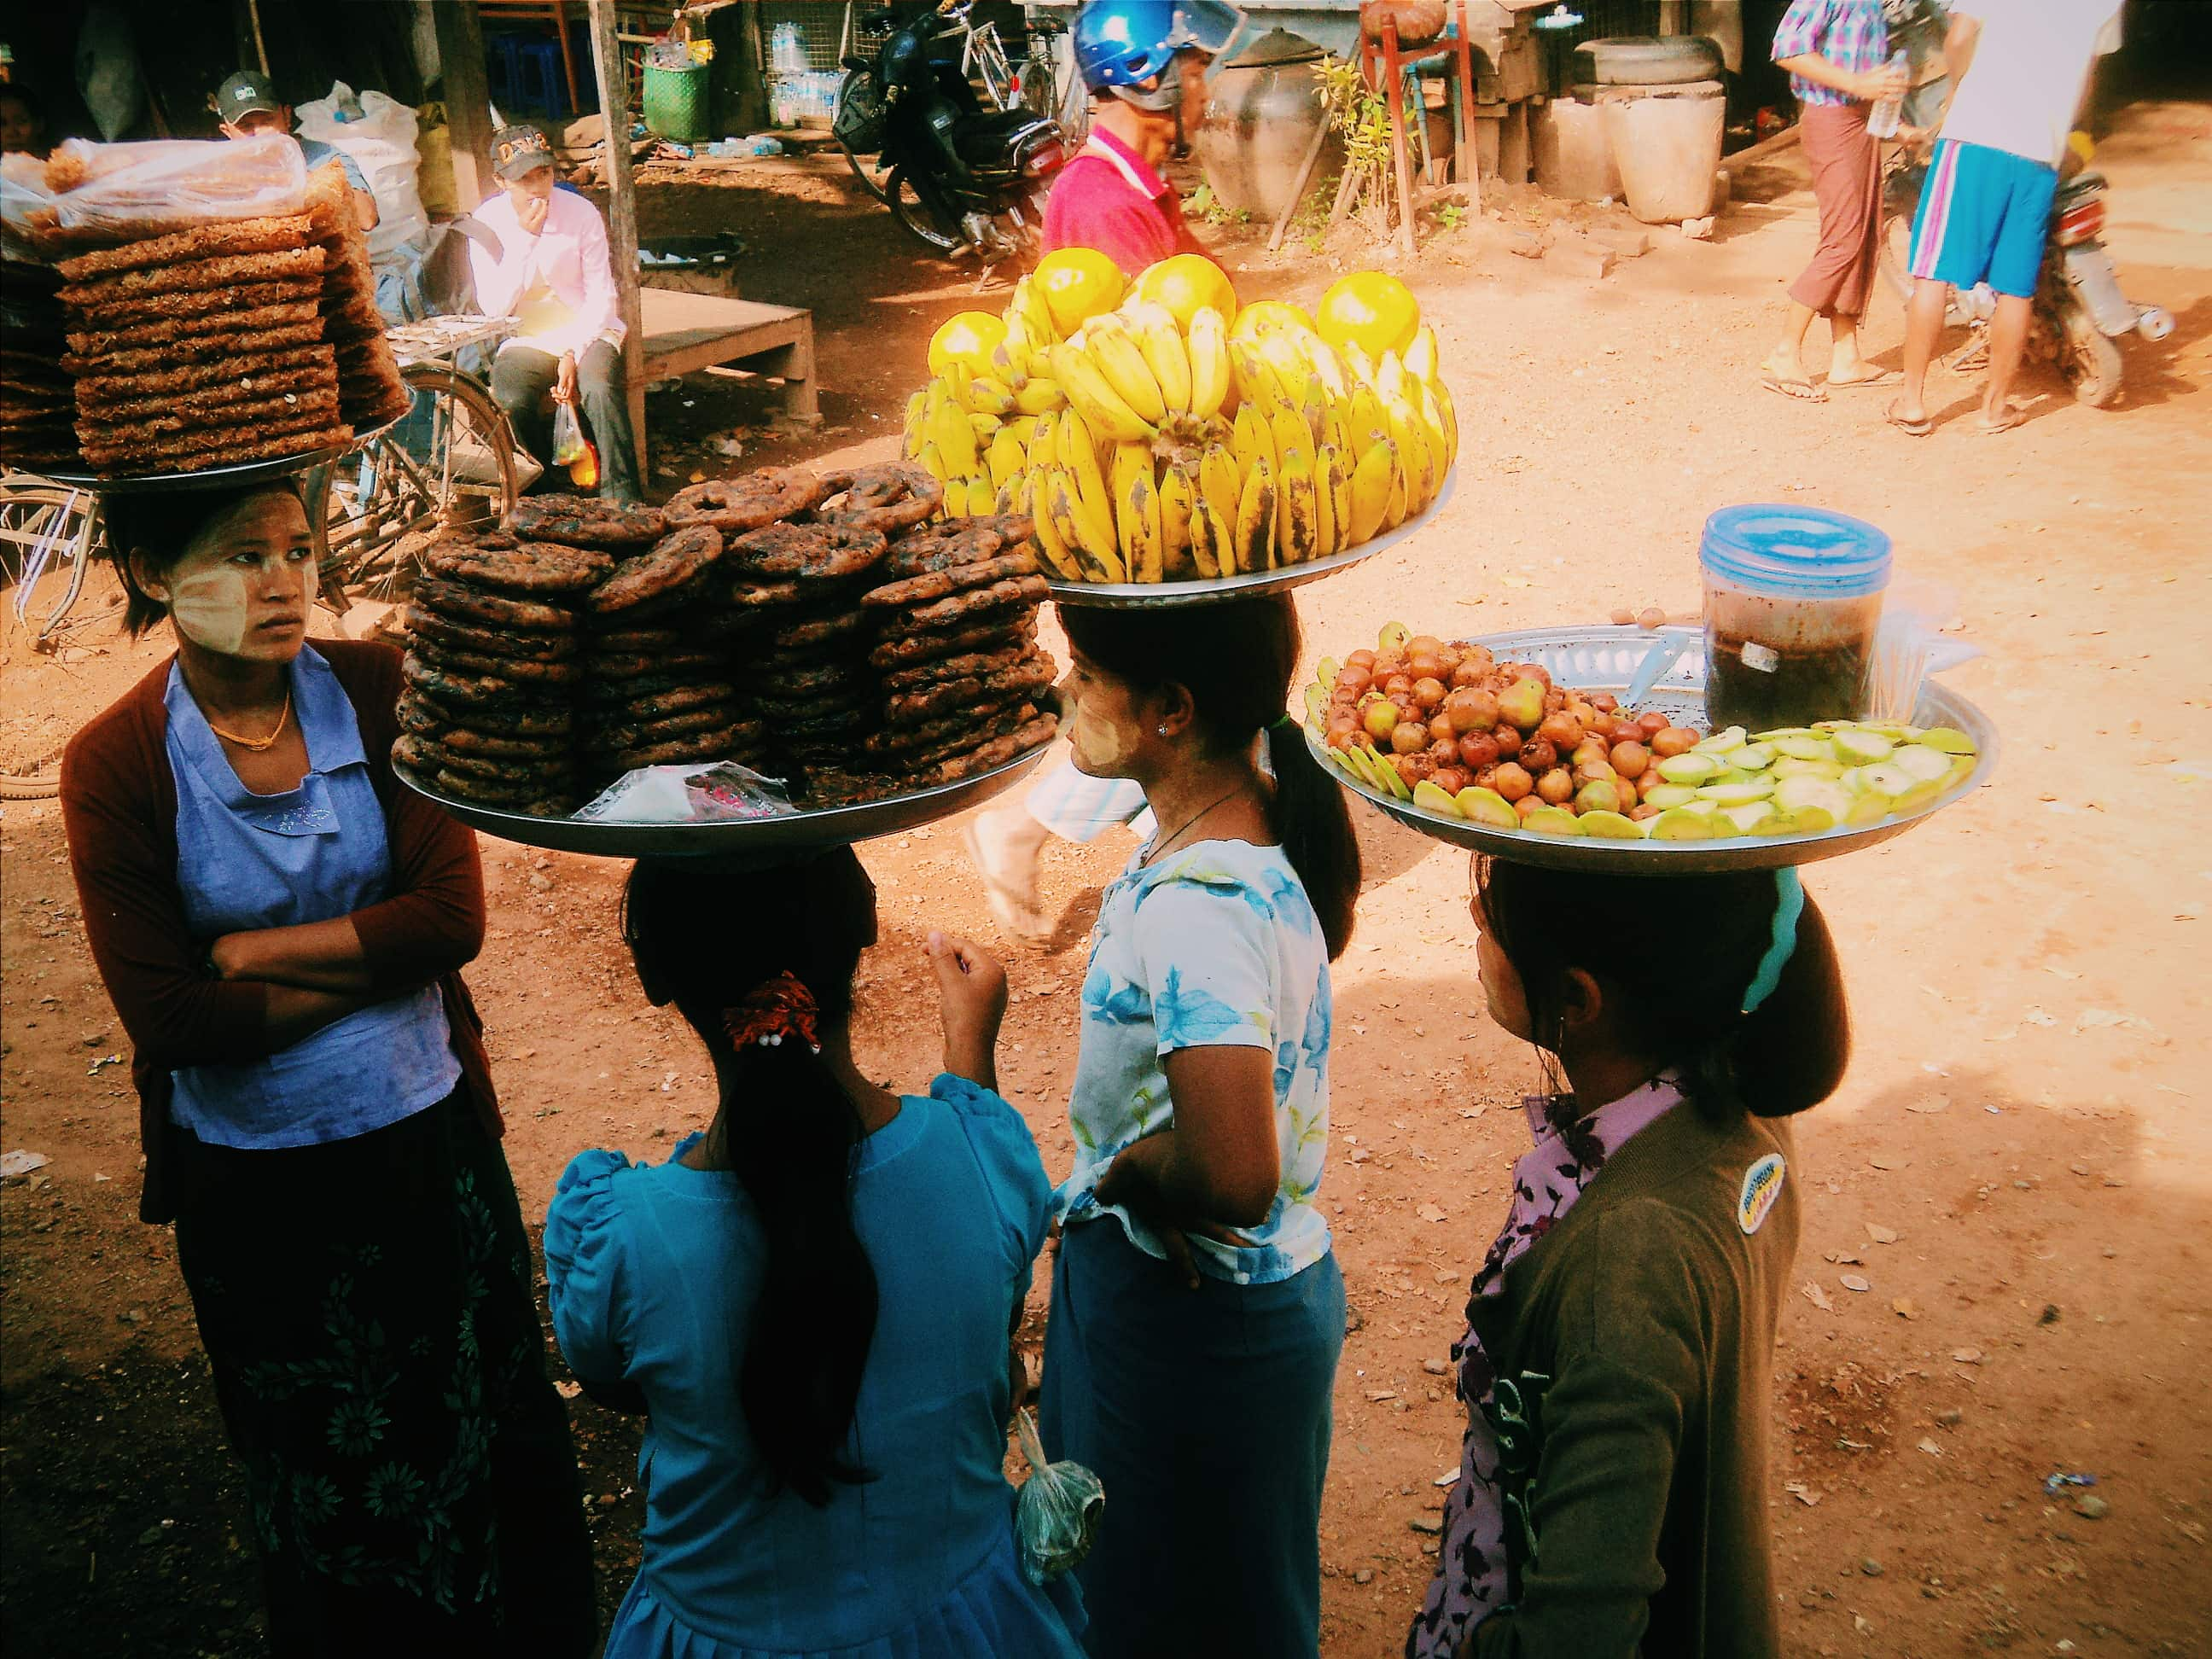 Street food. Travel Myanmar in a low budget.